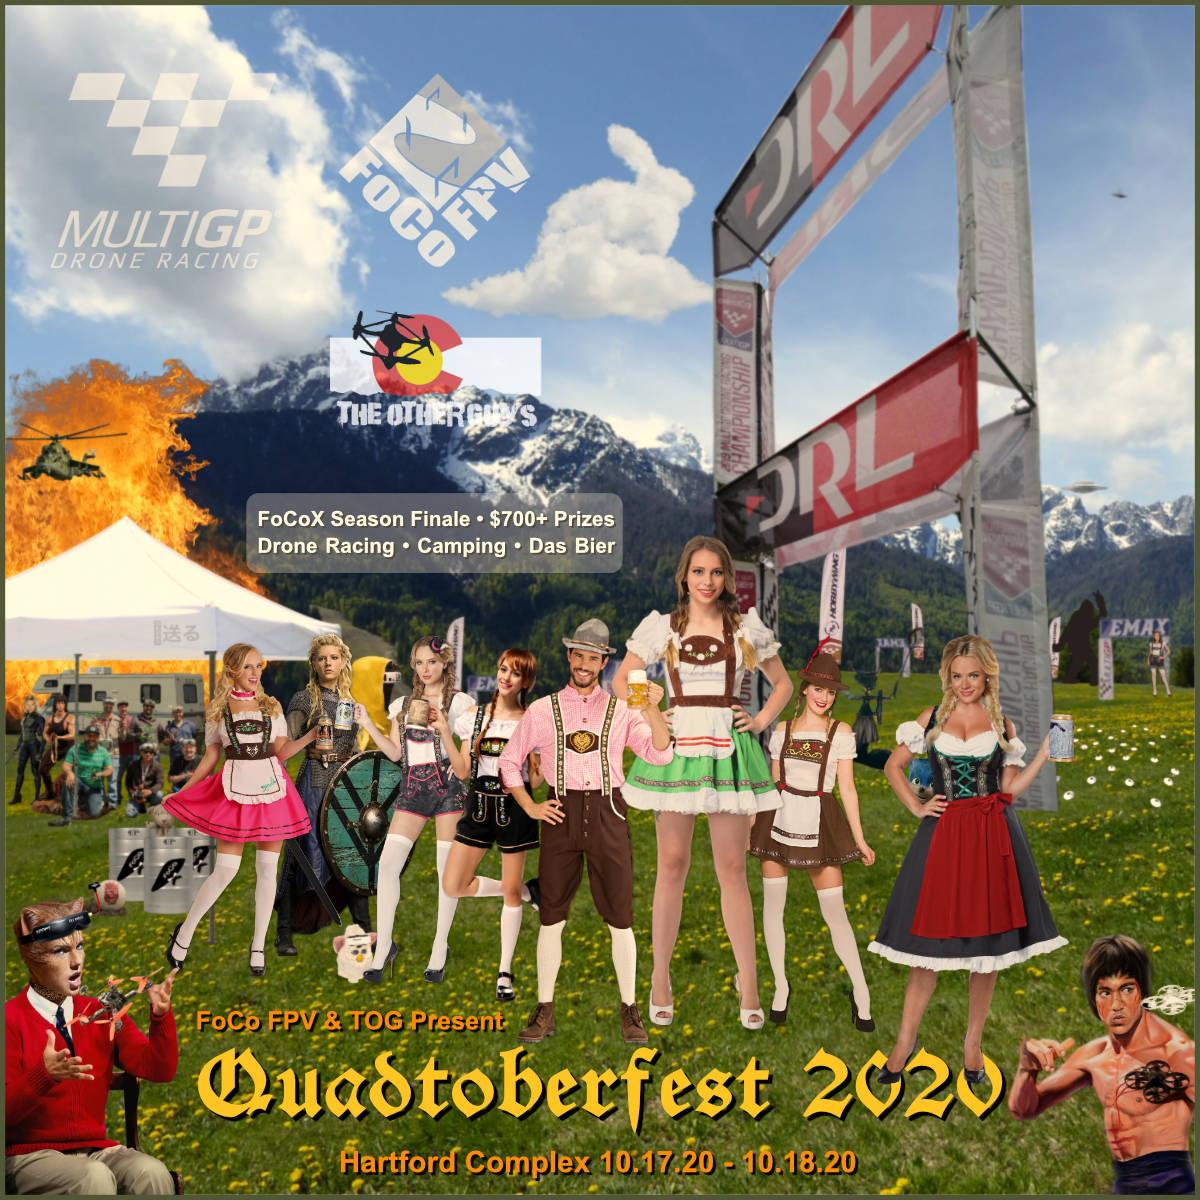 Quadtoberfest 2020